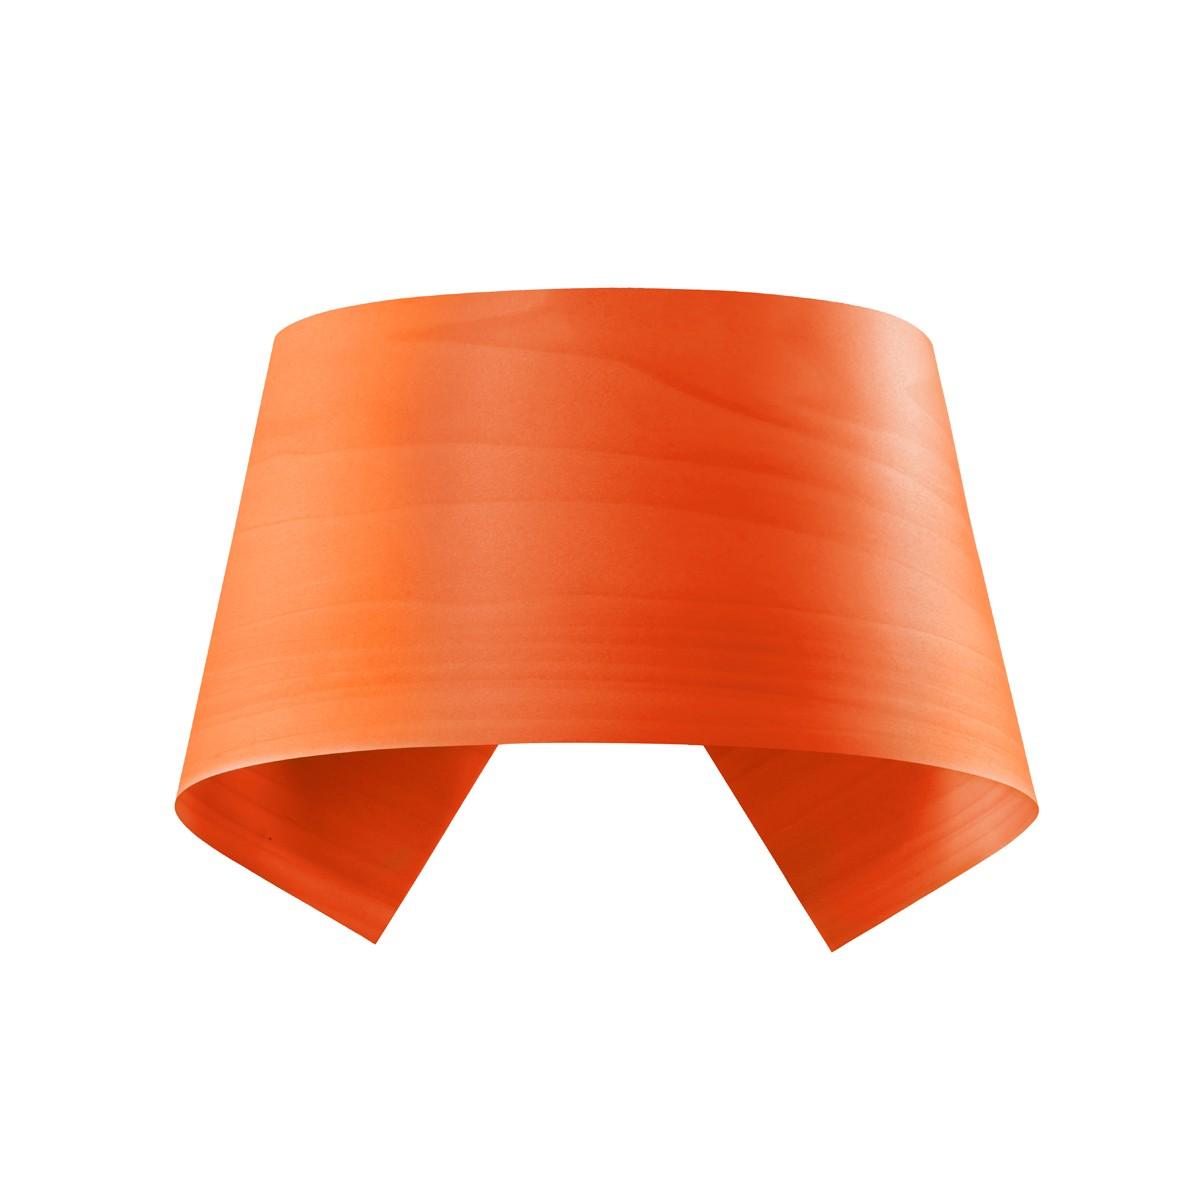 LZF Lamps Hi-Collar LED Wandleuchte, orange